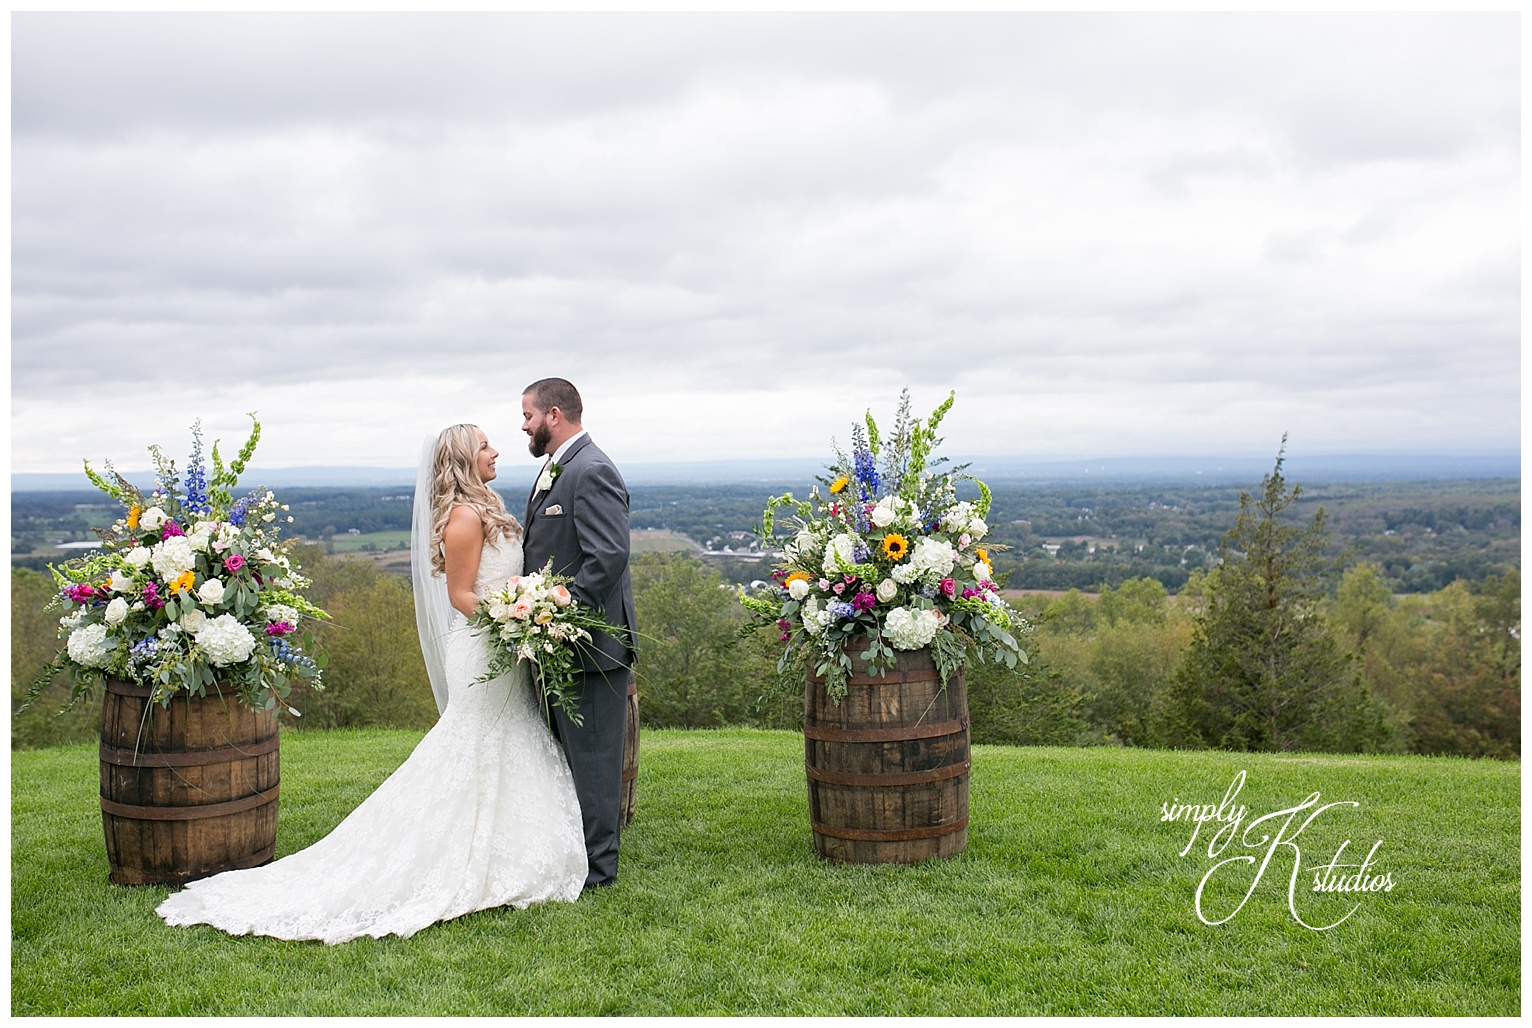 Taylor Rental Wedding Rentals.jpg